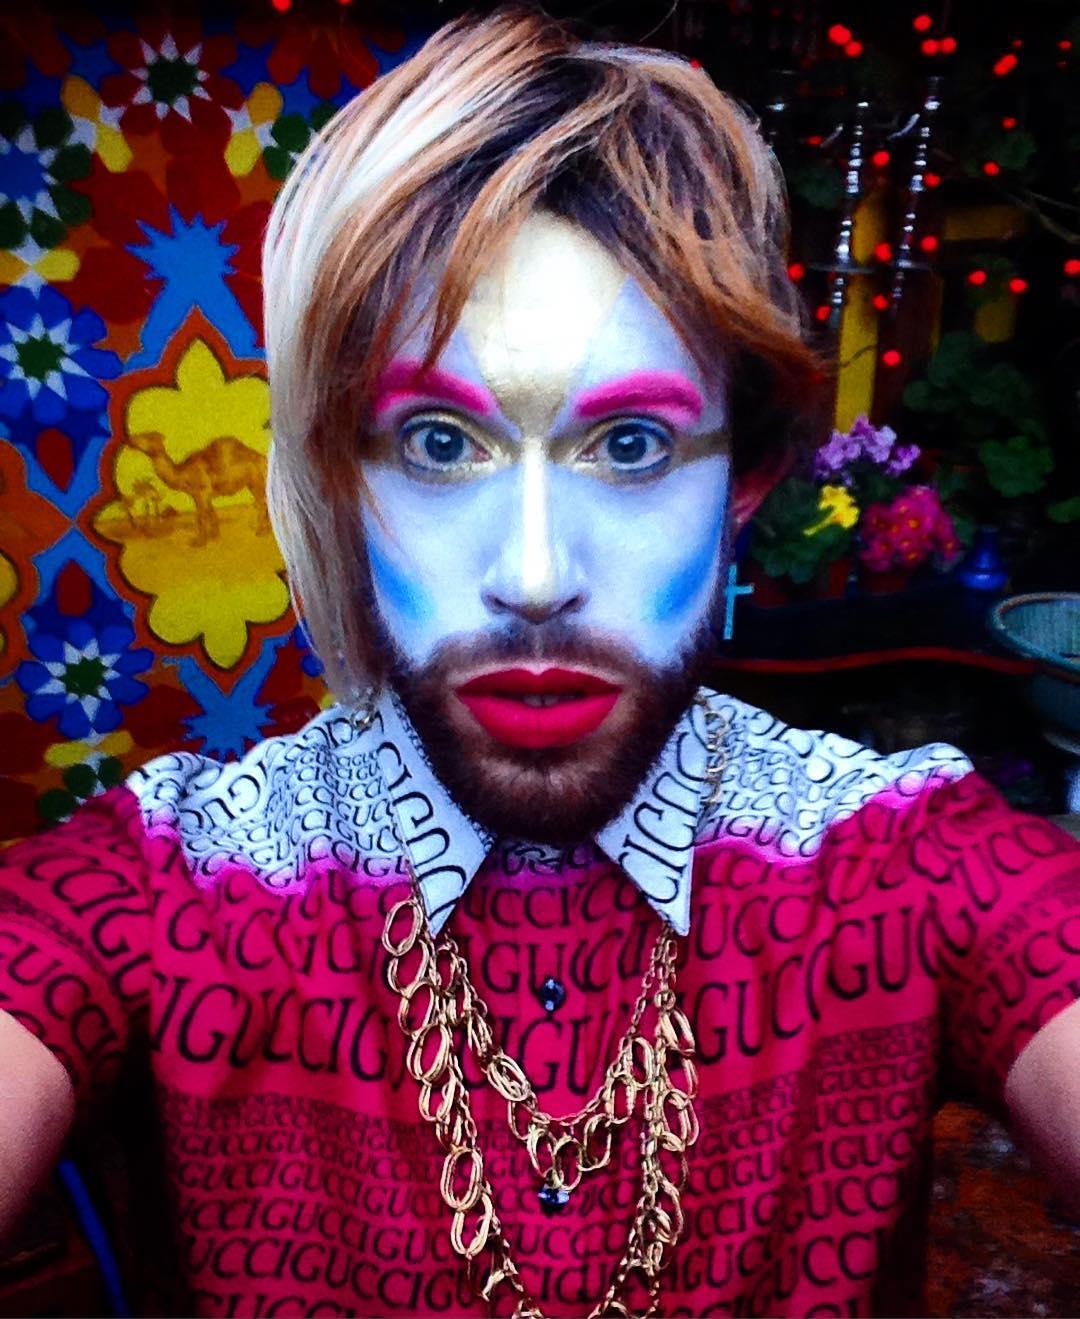 David Cumming 2 - Cabaret character HYMN.jpg